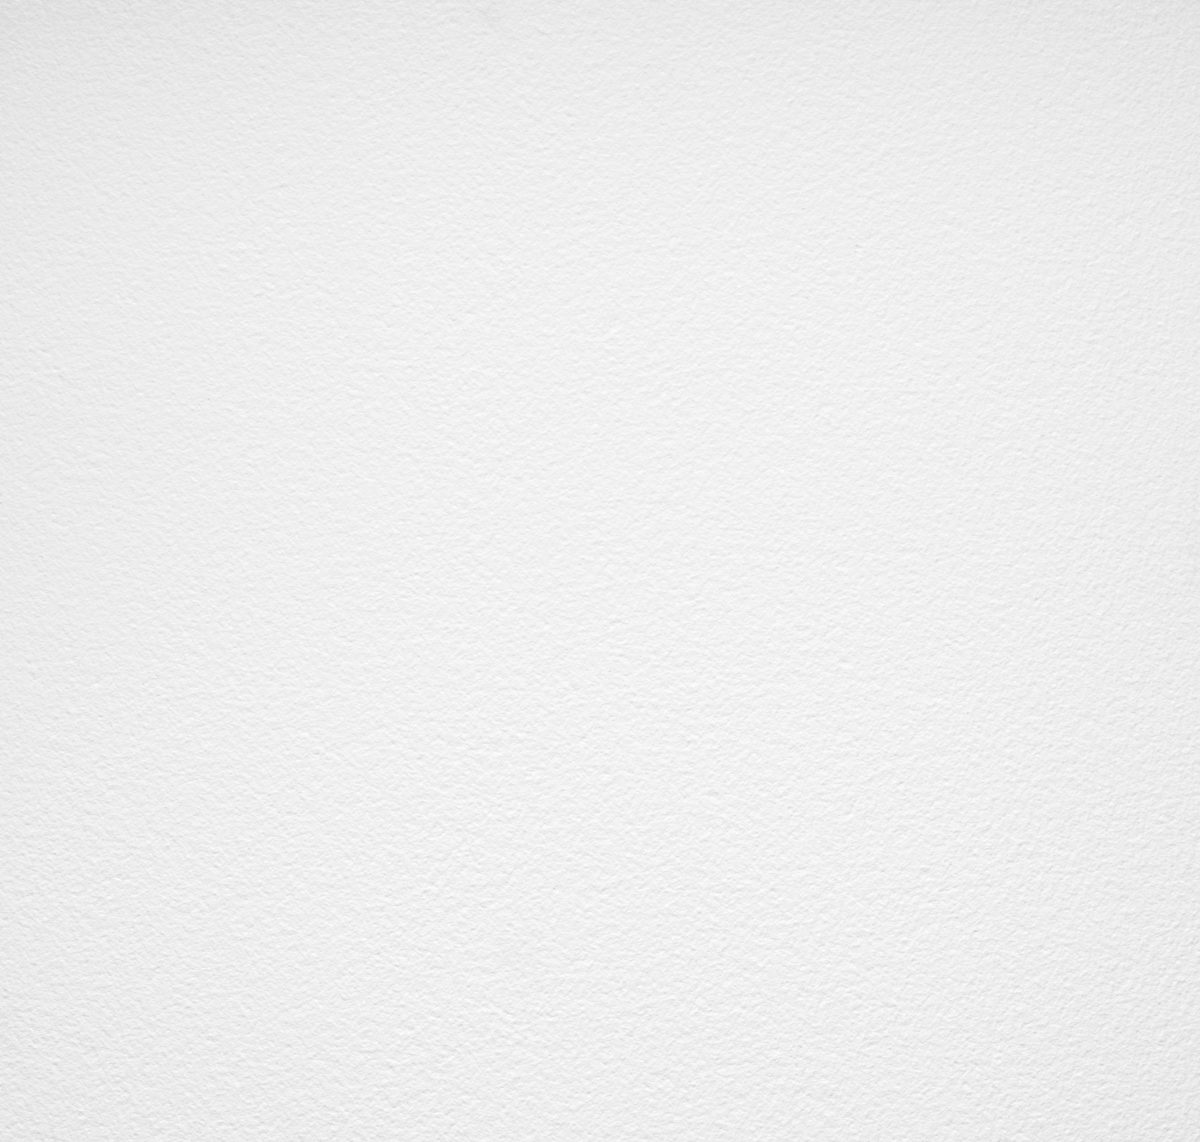 Lapitech Worktop Absolute White - Vesuvio Finish